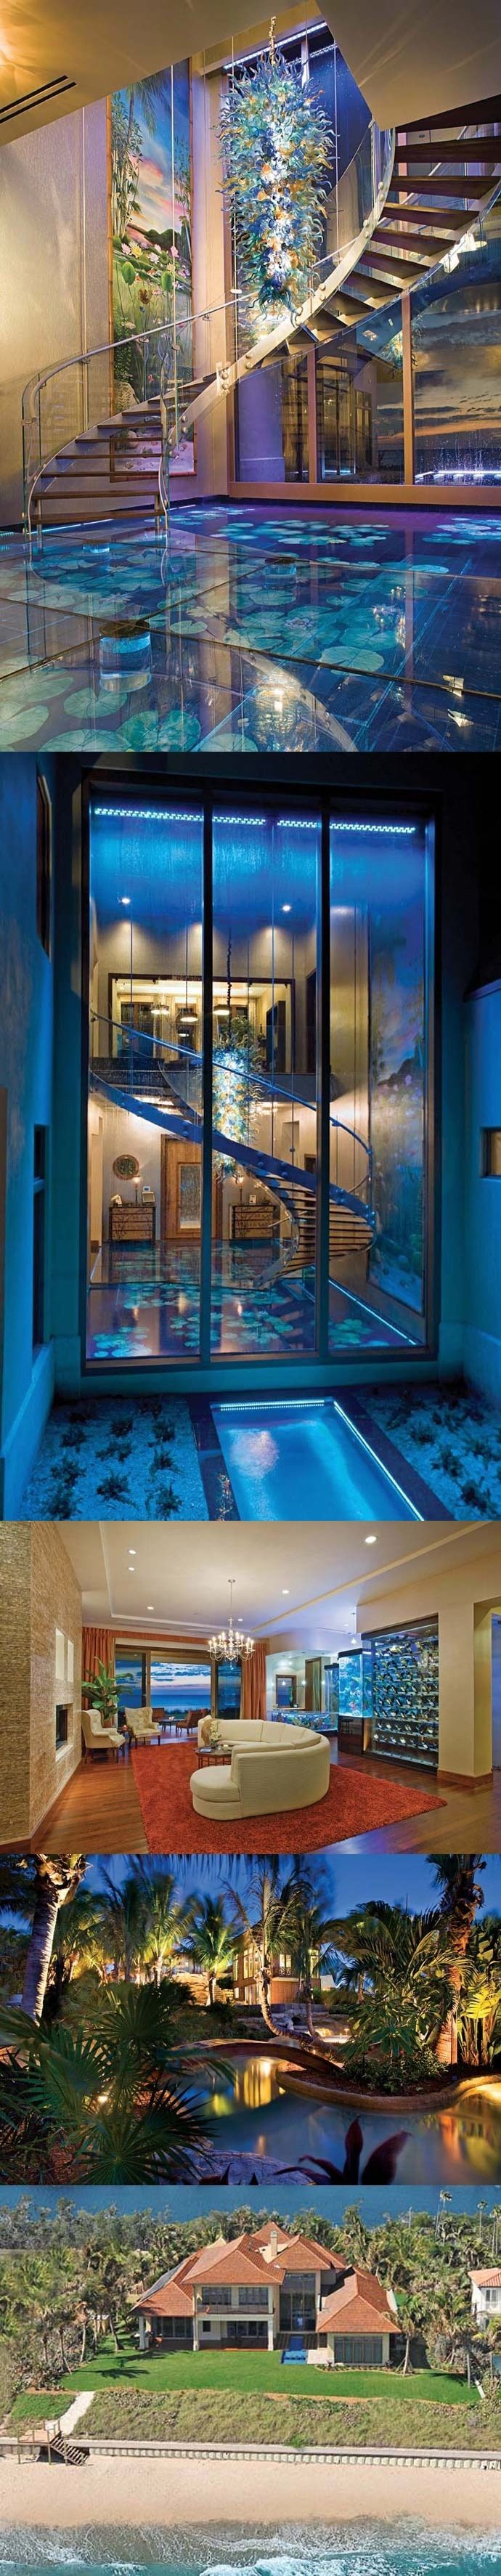 Amazing Florida Eco-Mansion photography home mansion glass amazing modern luxury architecture homes dream home mansions amazing homes